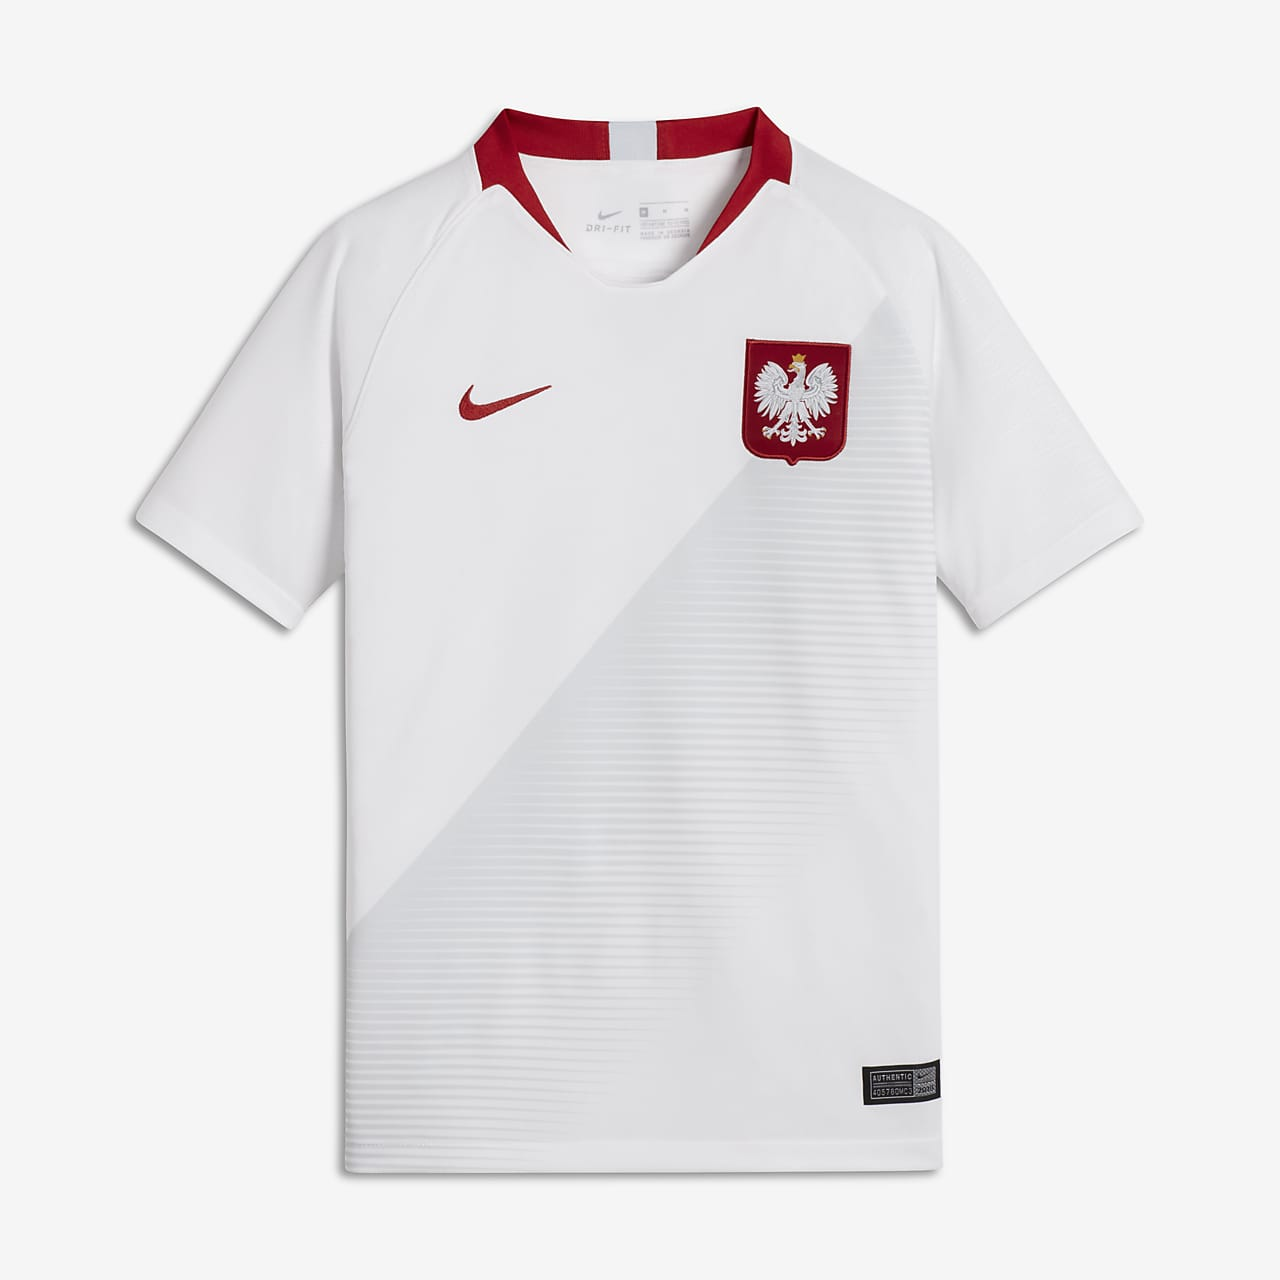 2018 Poland Stadium Home Older Kids' Football Shirt